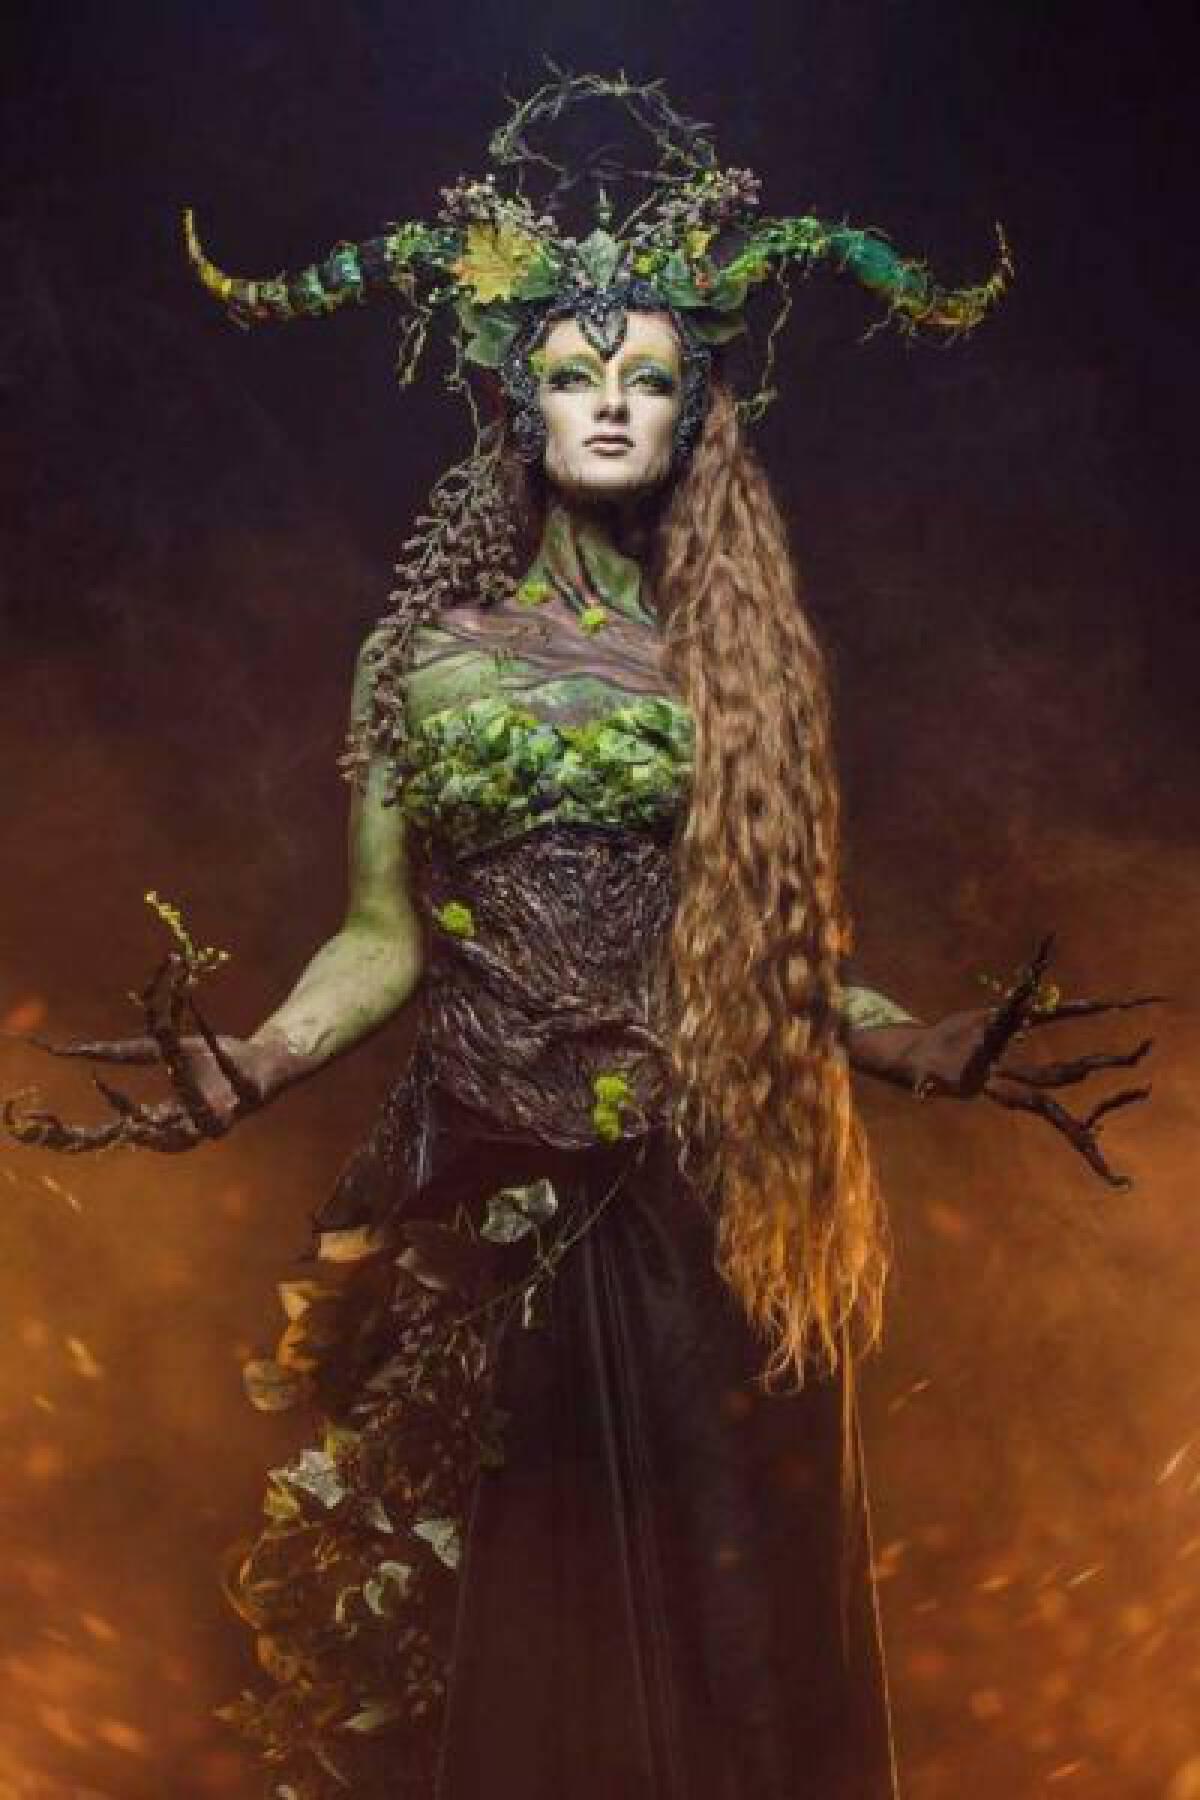 Model Sidney Rubinoe posing in her Mother Earth costume and makeup. Courtesy of Dillon Morningstar